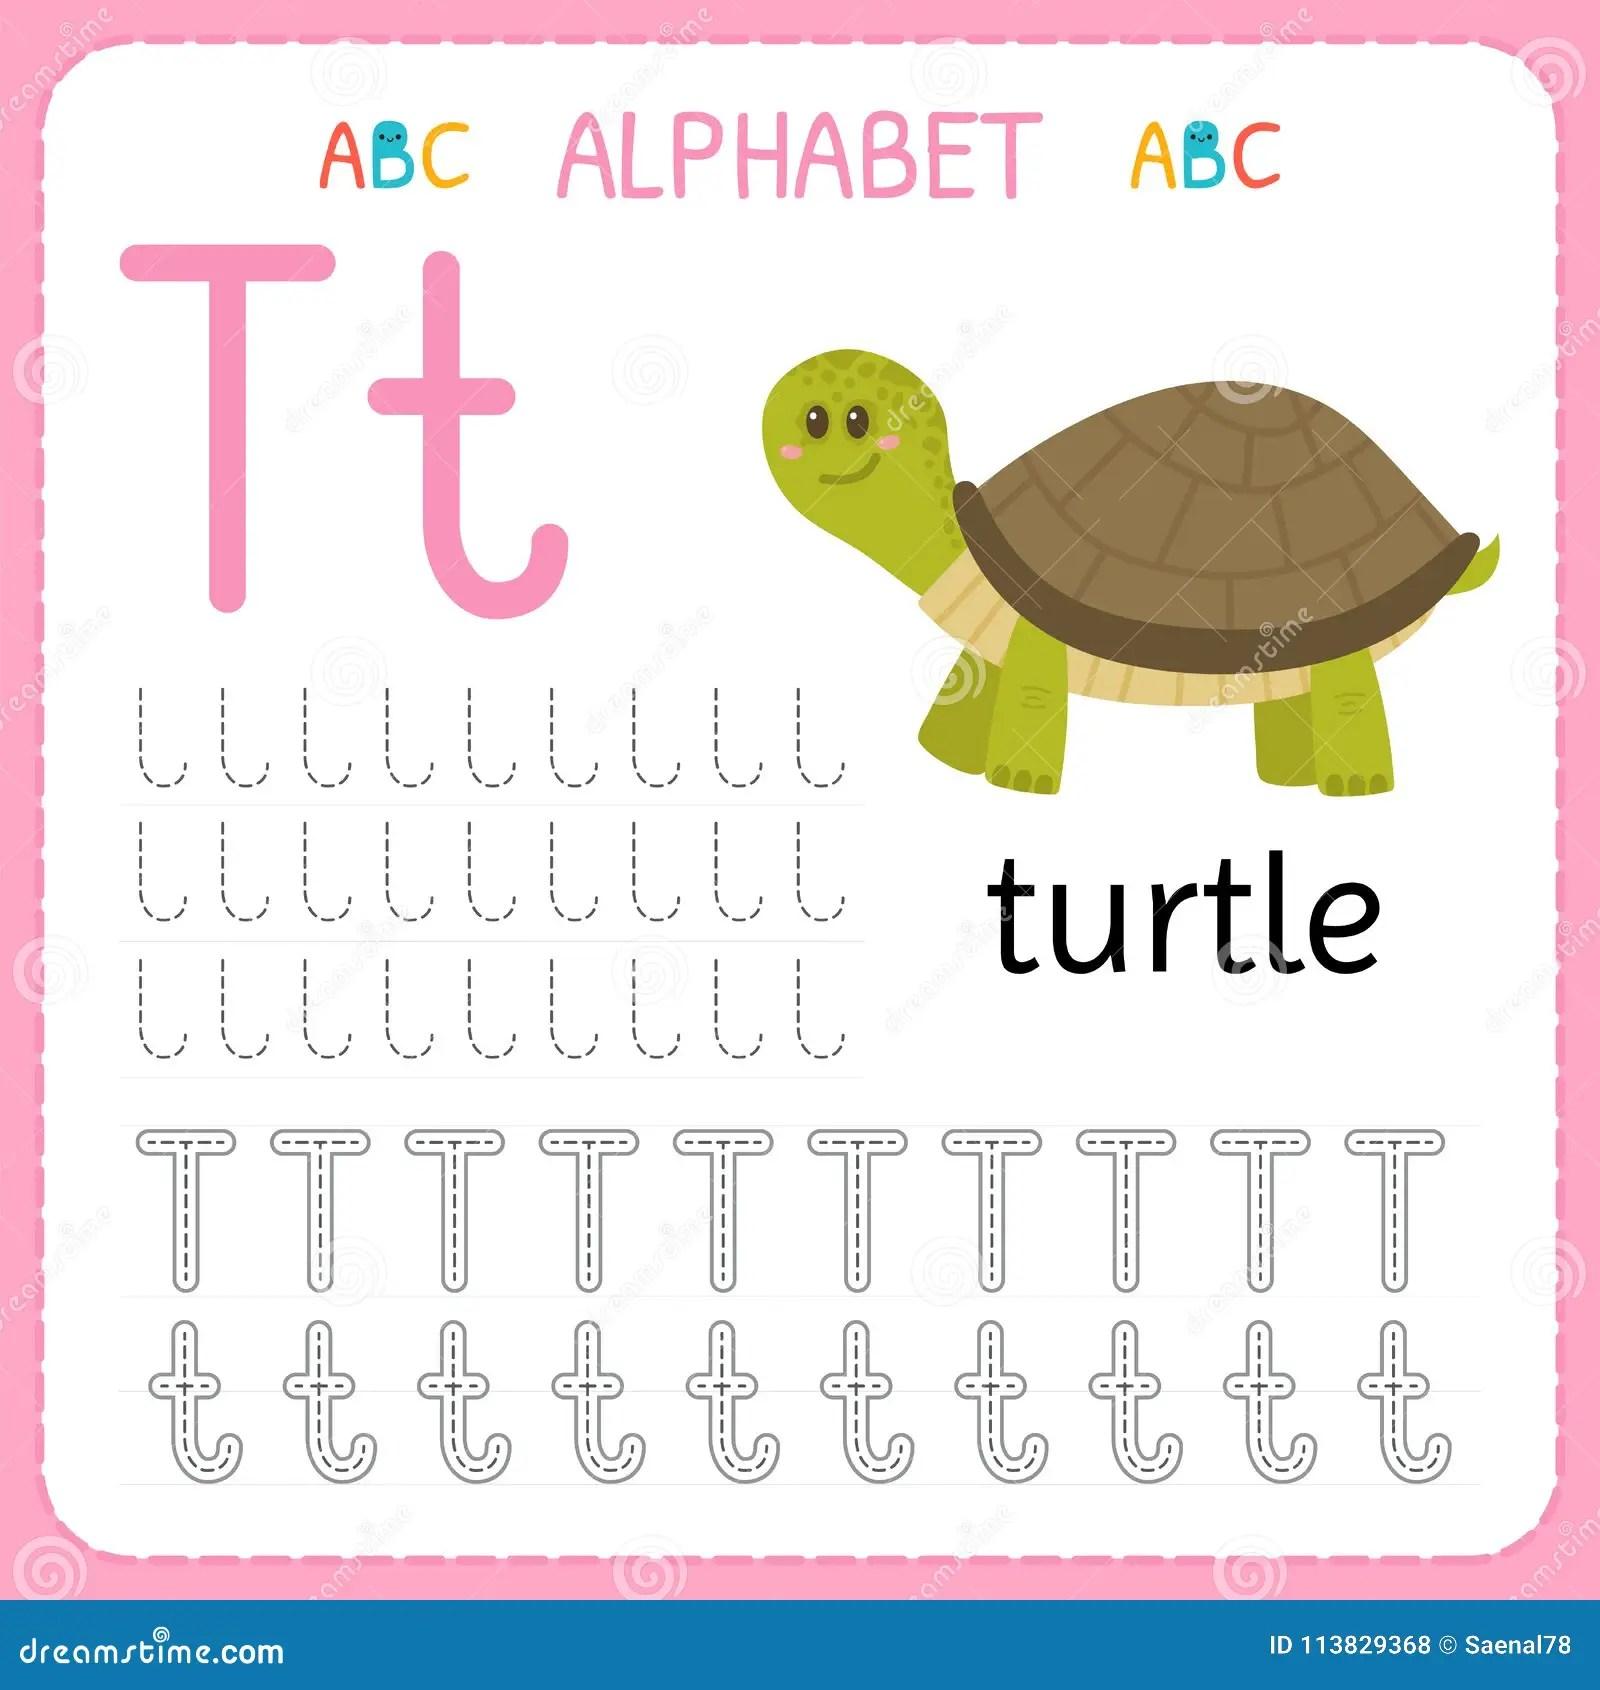 Alphabet Tracing Worksheet For Preschool And Kindergarten Writing Practice Letter T Exercises